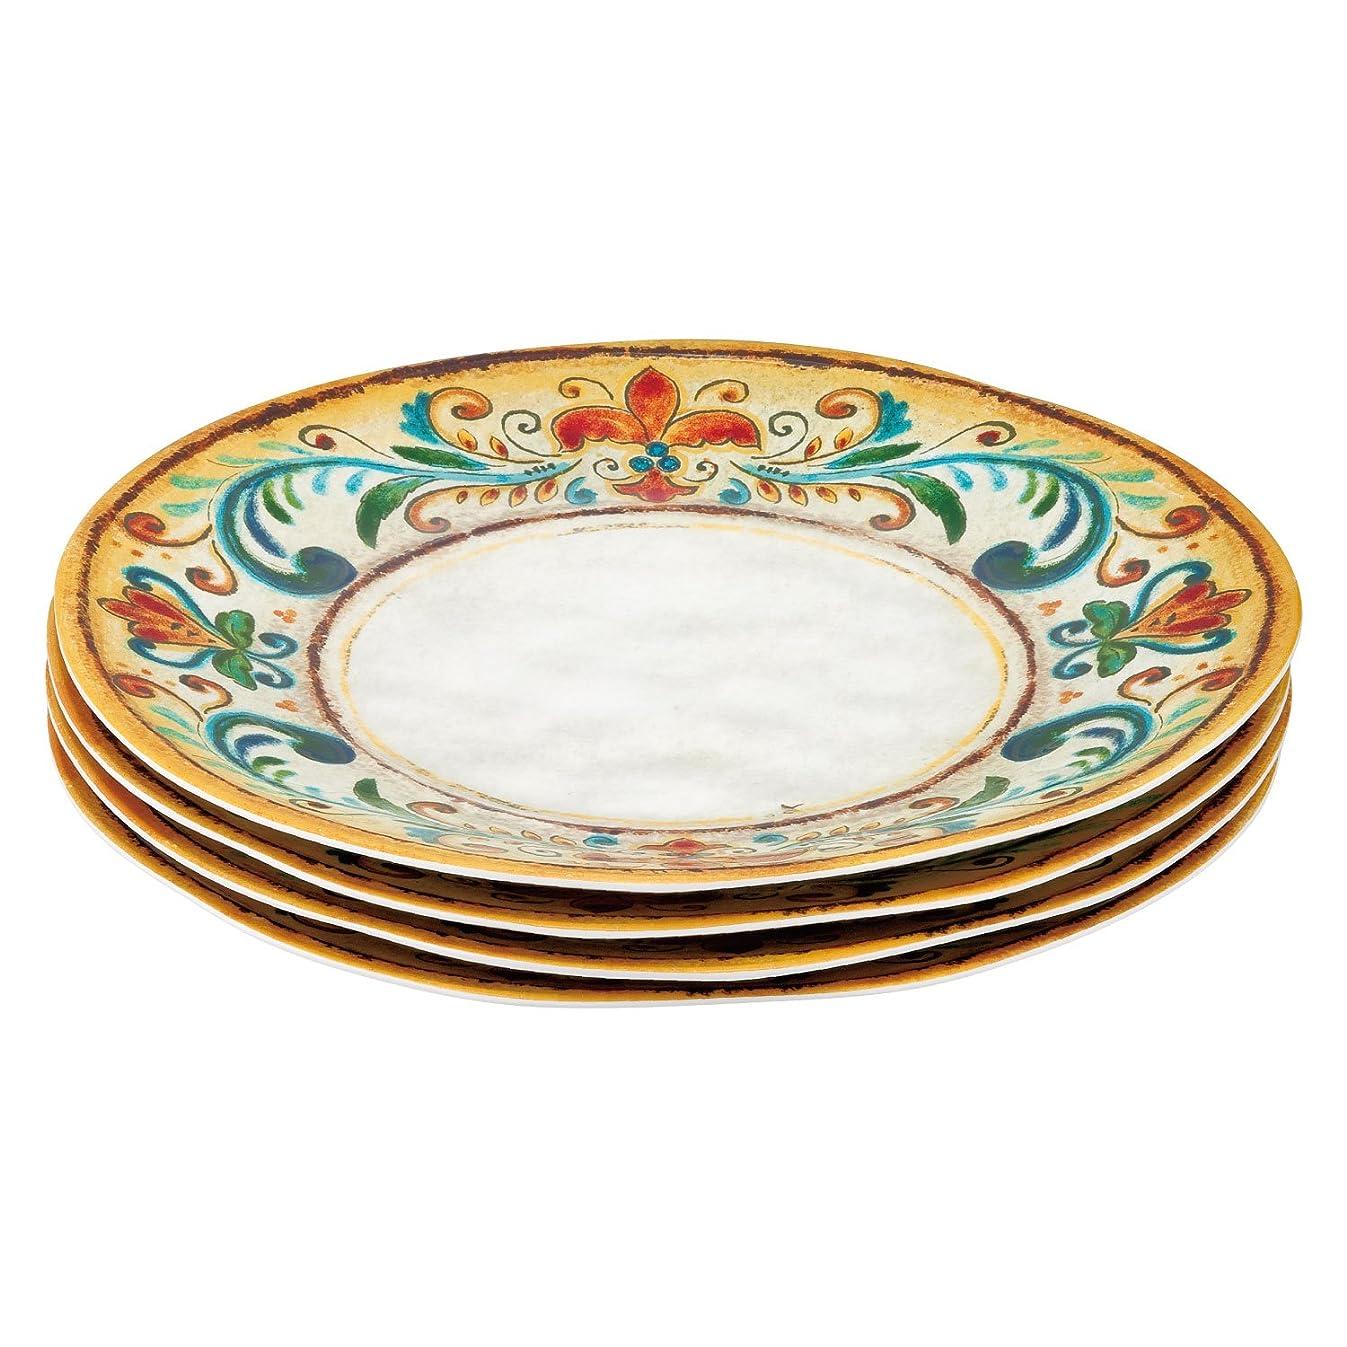 Gourmet Art 4-Piece Tuscany Melamine 11-inch Dinner Plate